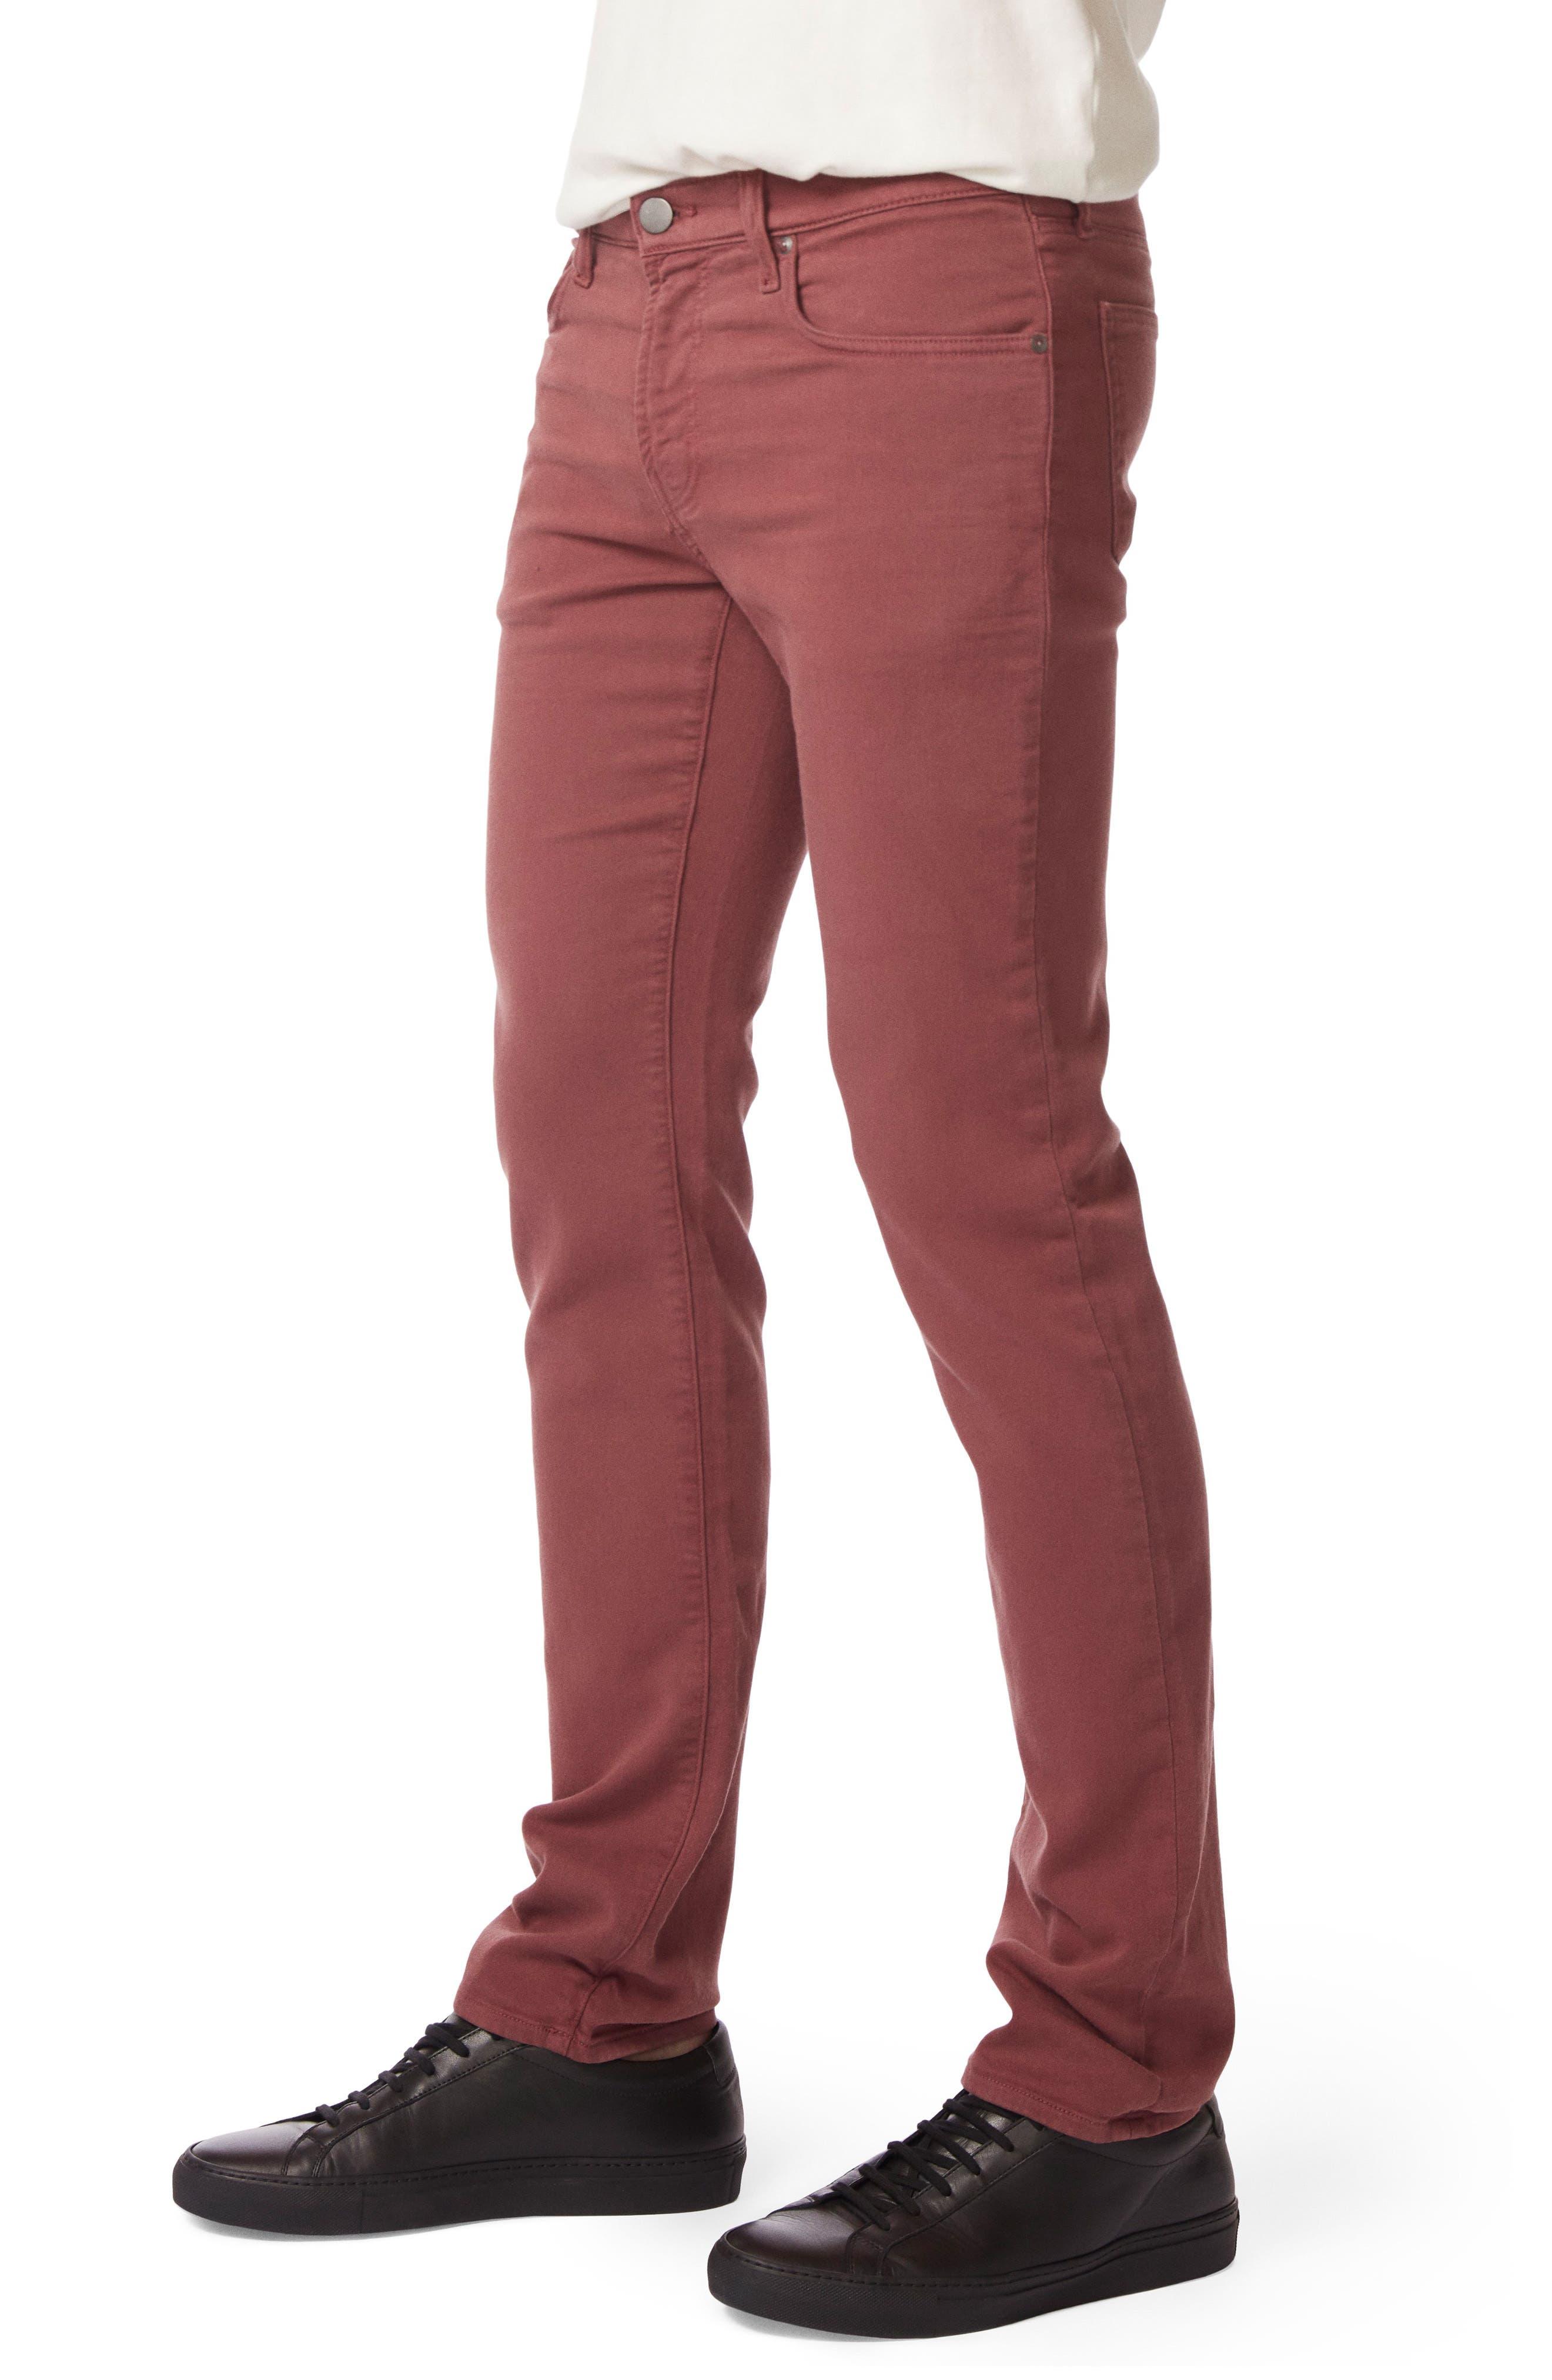 Kane Slim Straight Leg Pants,                             Alternate thumbnail 3, color,                             019